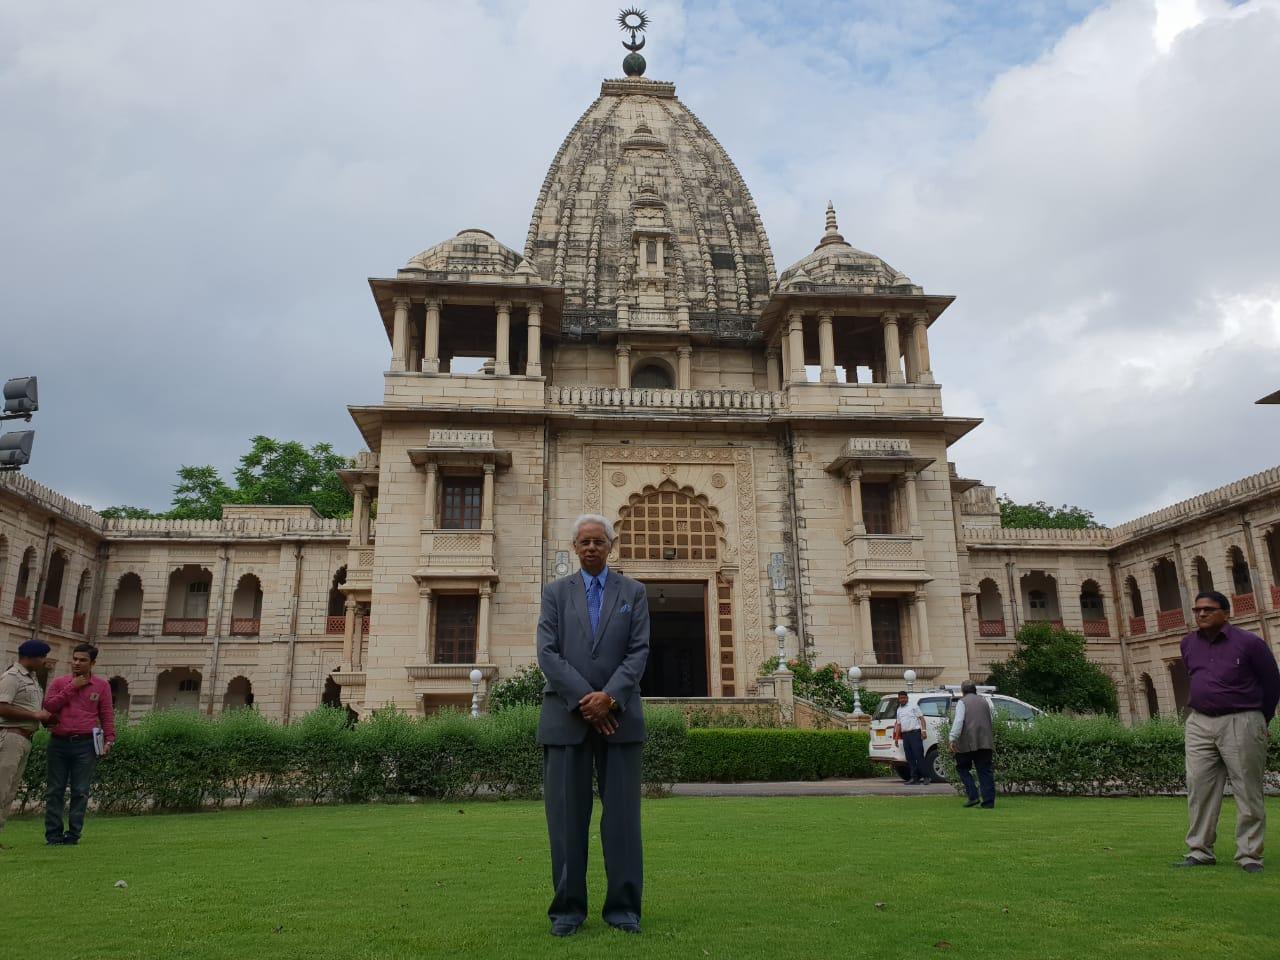 Bangladesh High Commissioner Syed Muazzem Ali felt proud on his maiden visit to Vadodara